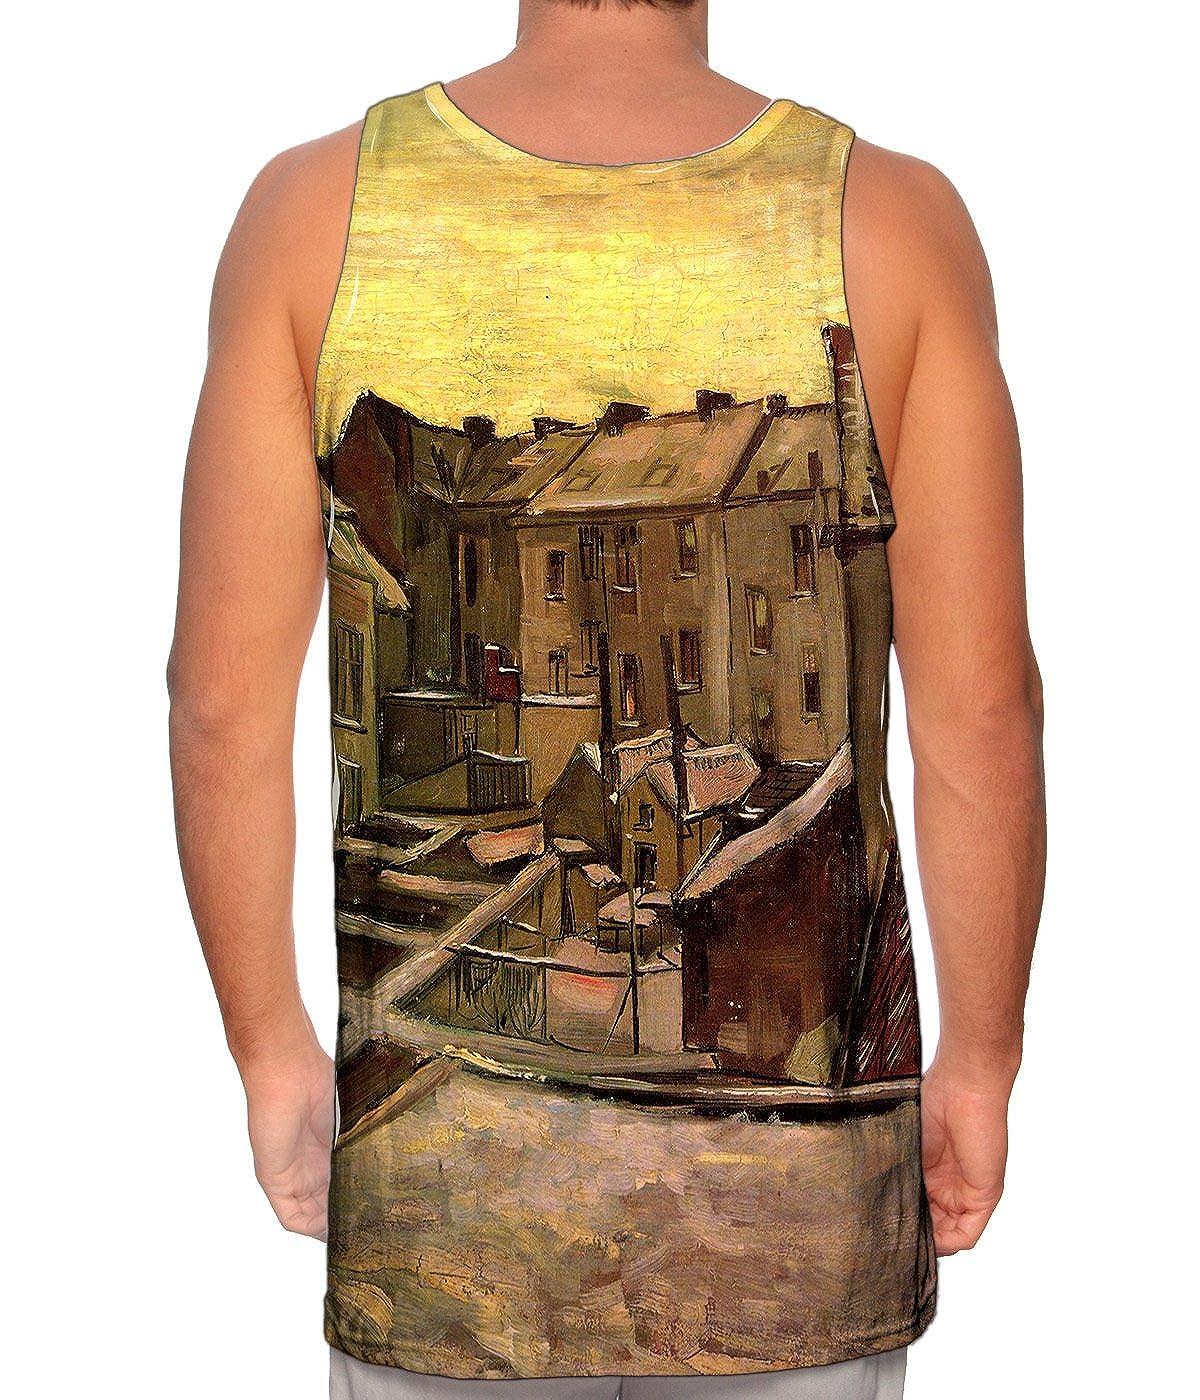 1885 Van Gogh Mens Tank Top Backyard of Old Houses -TShirt Yizzam